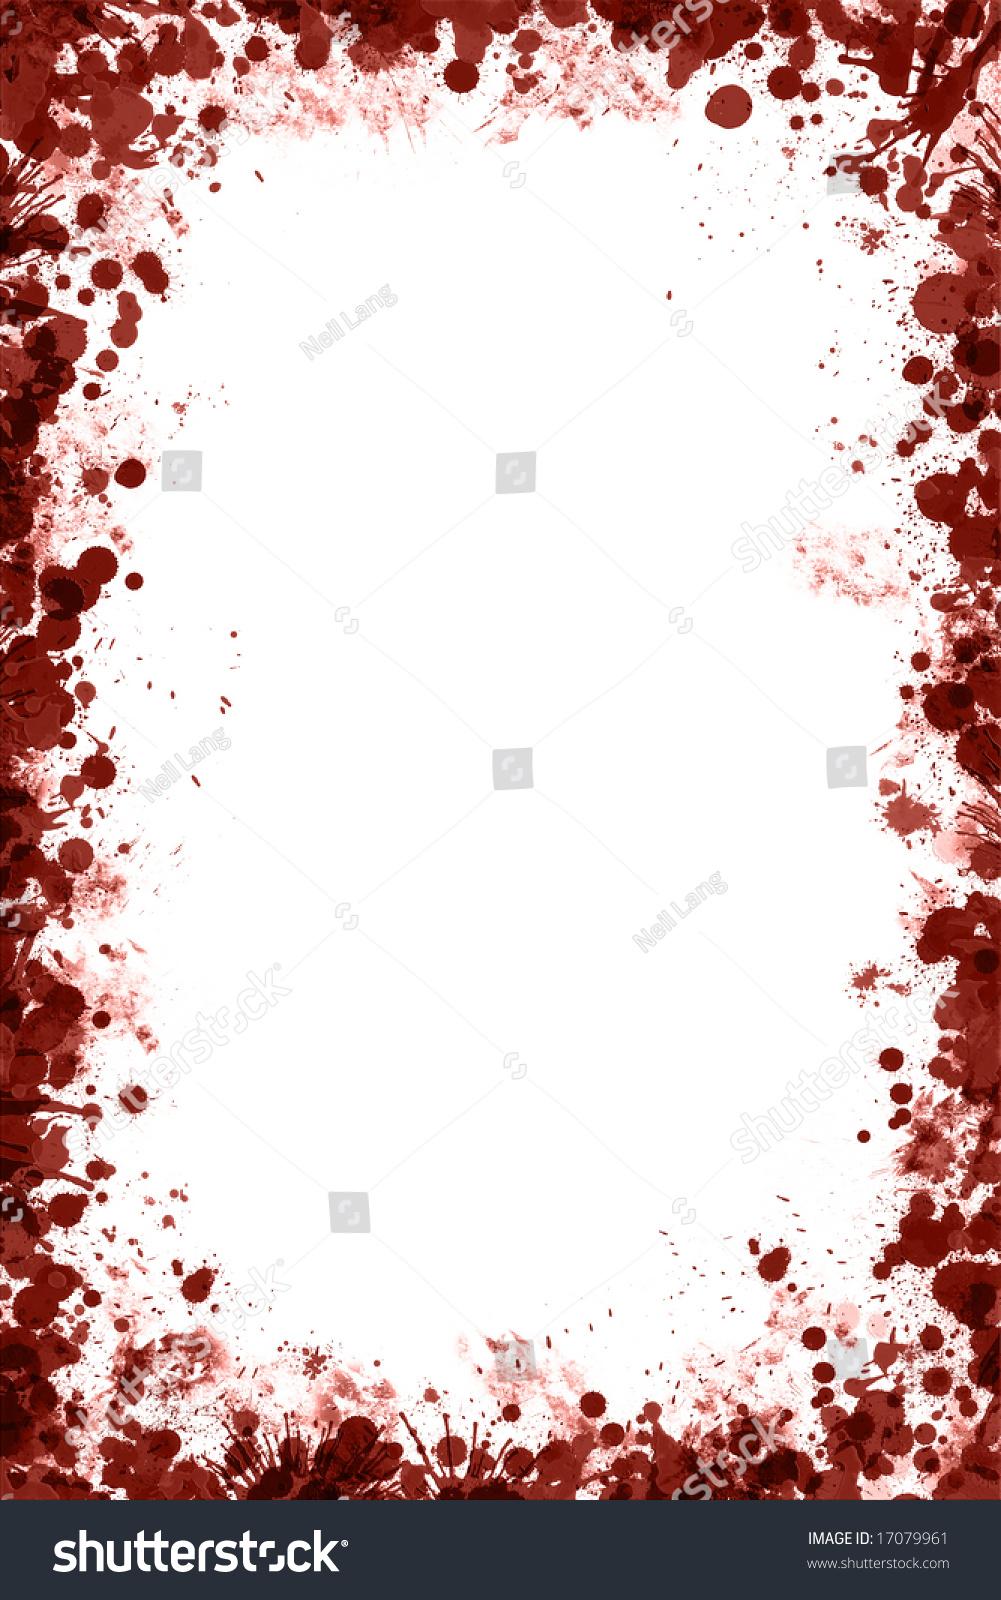 blood splat droplets frame white background stock